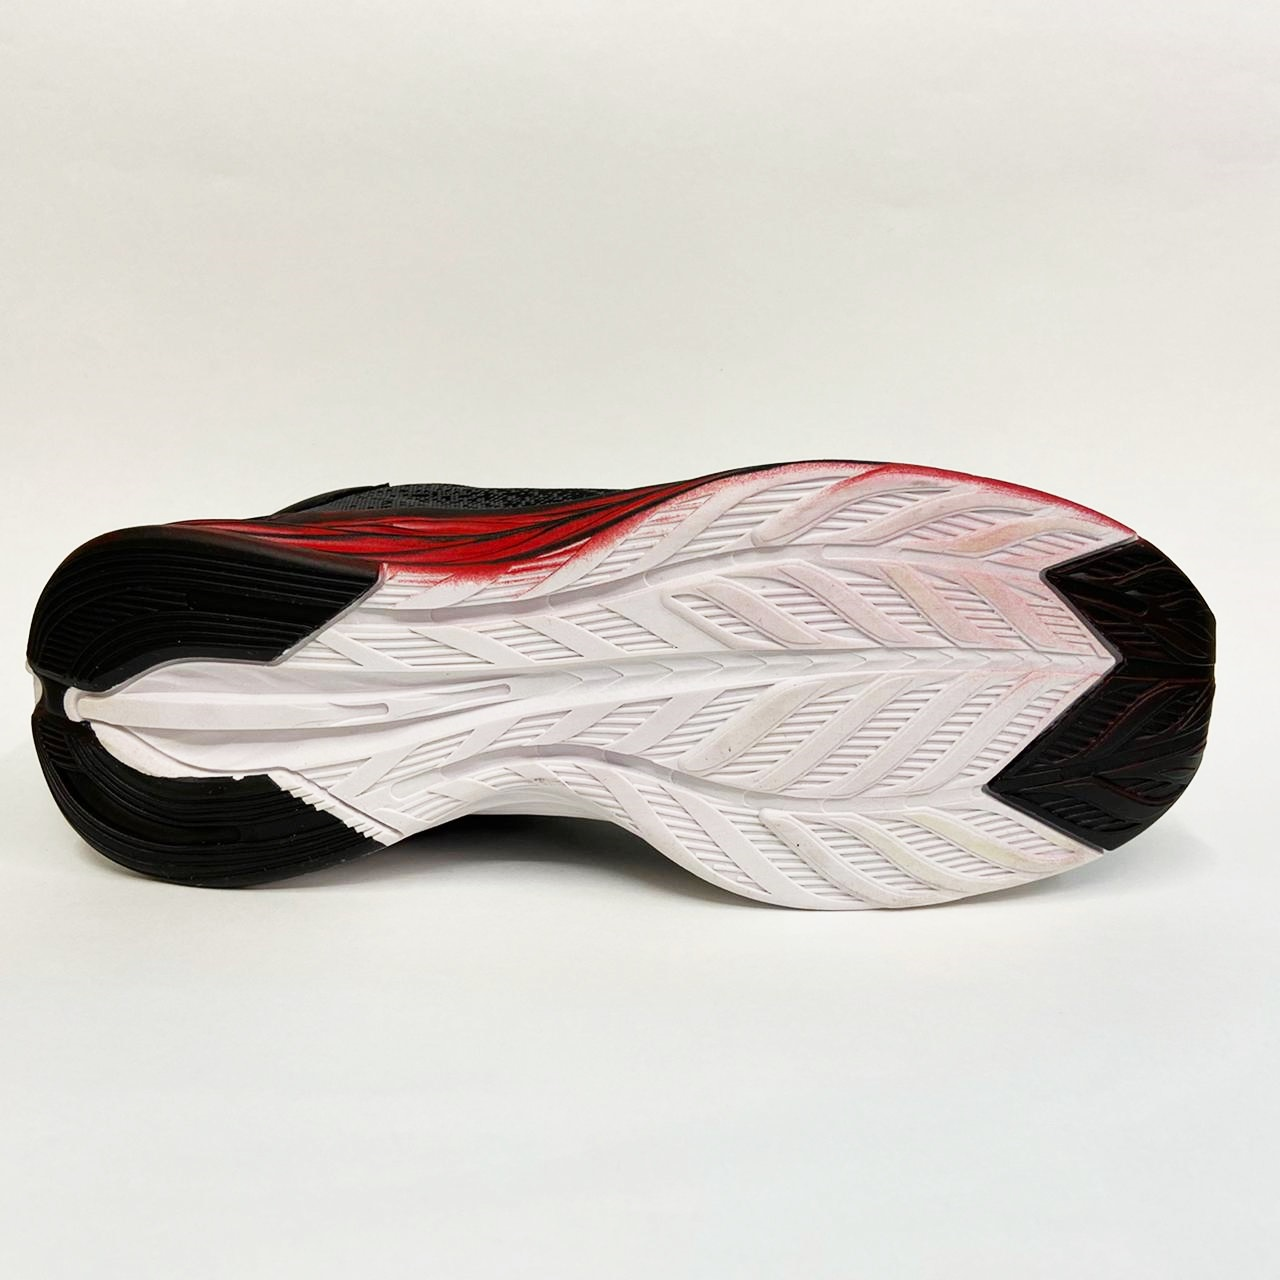 Tenis Masculino Replay RP20 - Preto/Vermelho